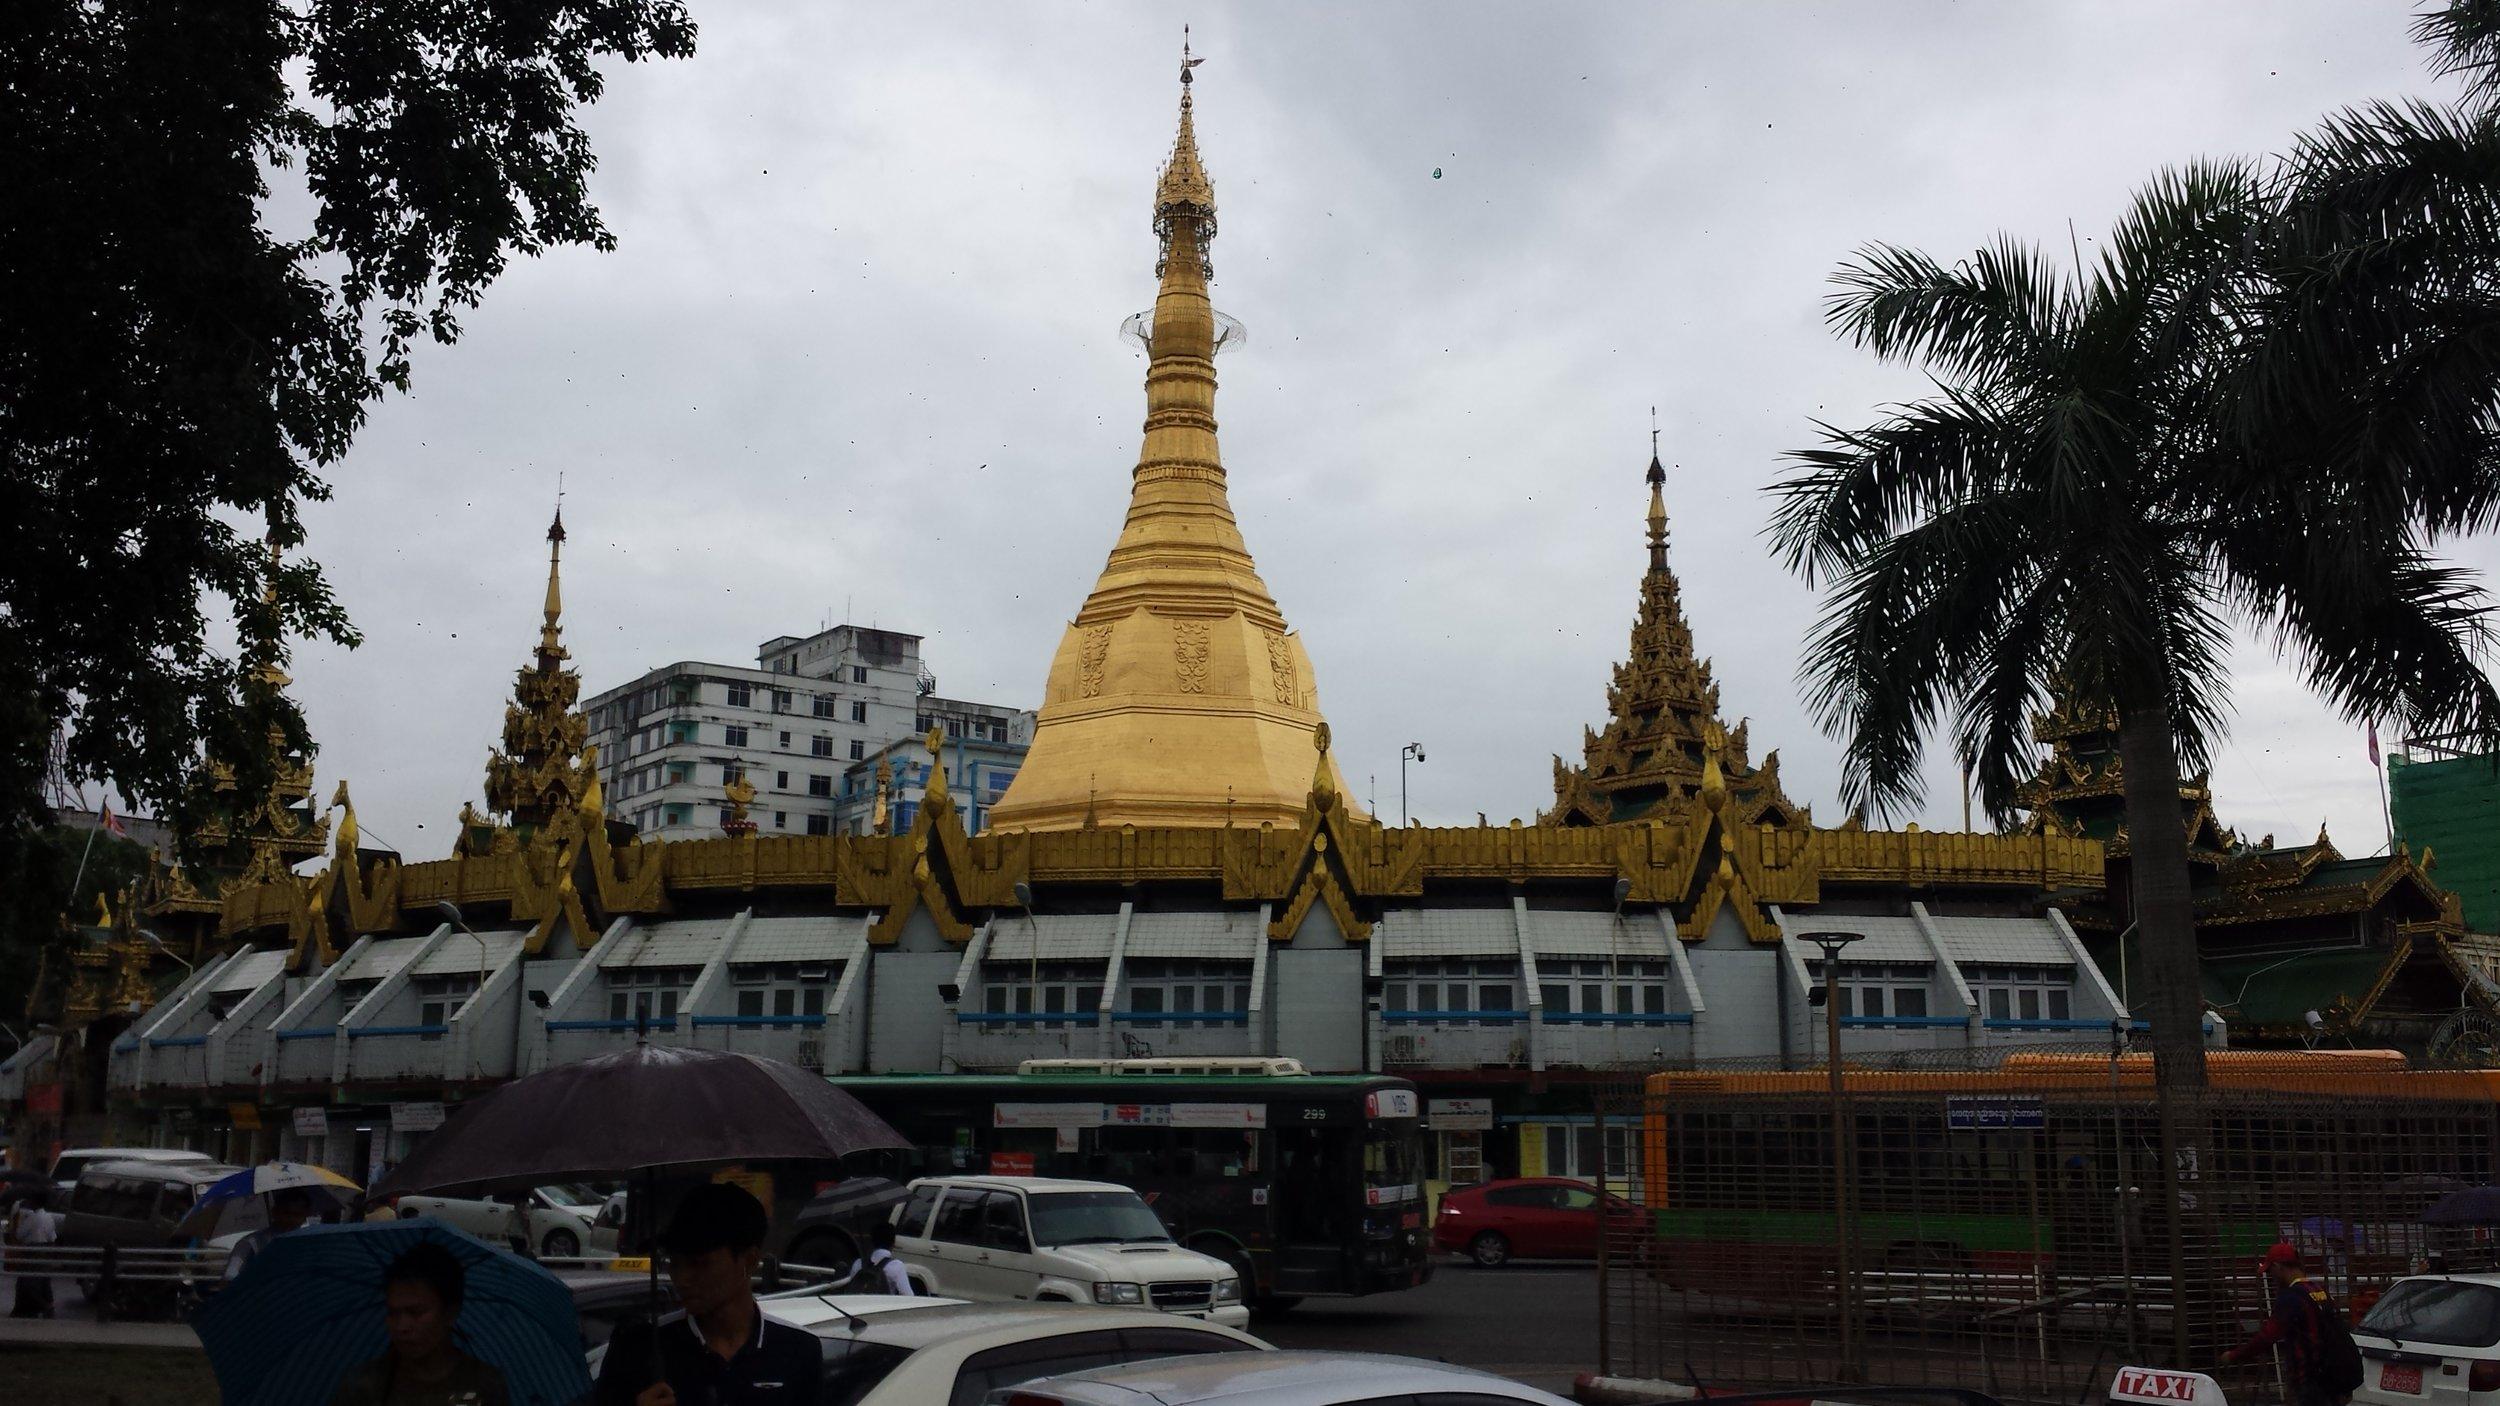 Botataung Pagoda in Yangon, Myanmar.